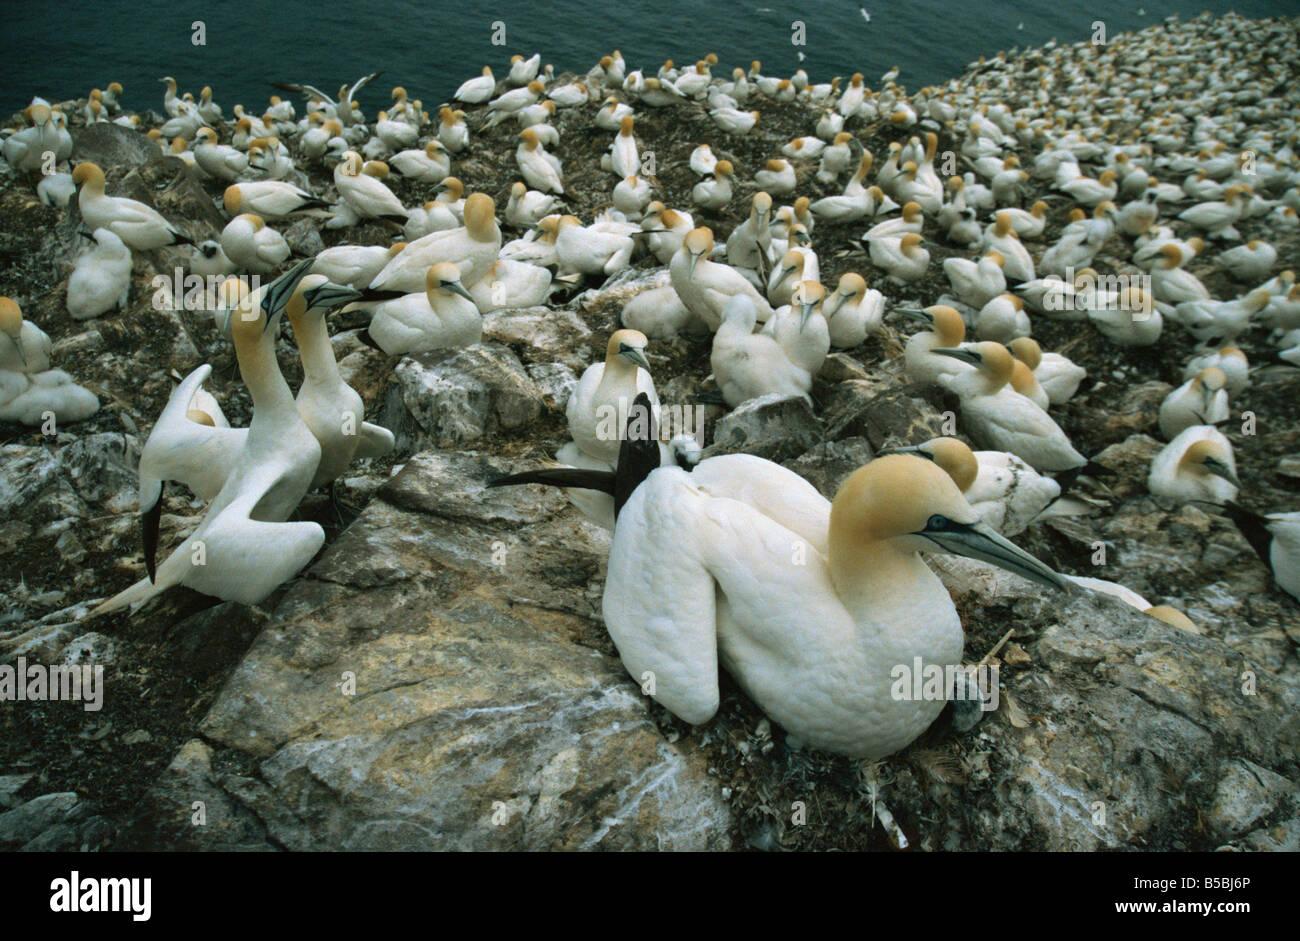 Gannets on nests, Bass Rock, East Lothian, Scotland, Europe - Stock Image